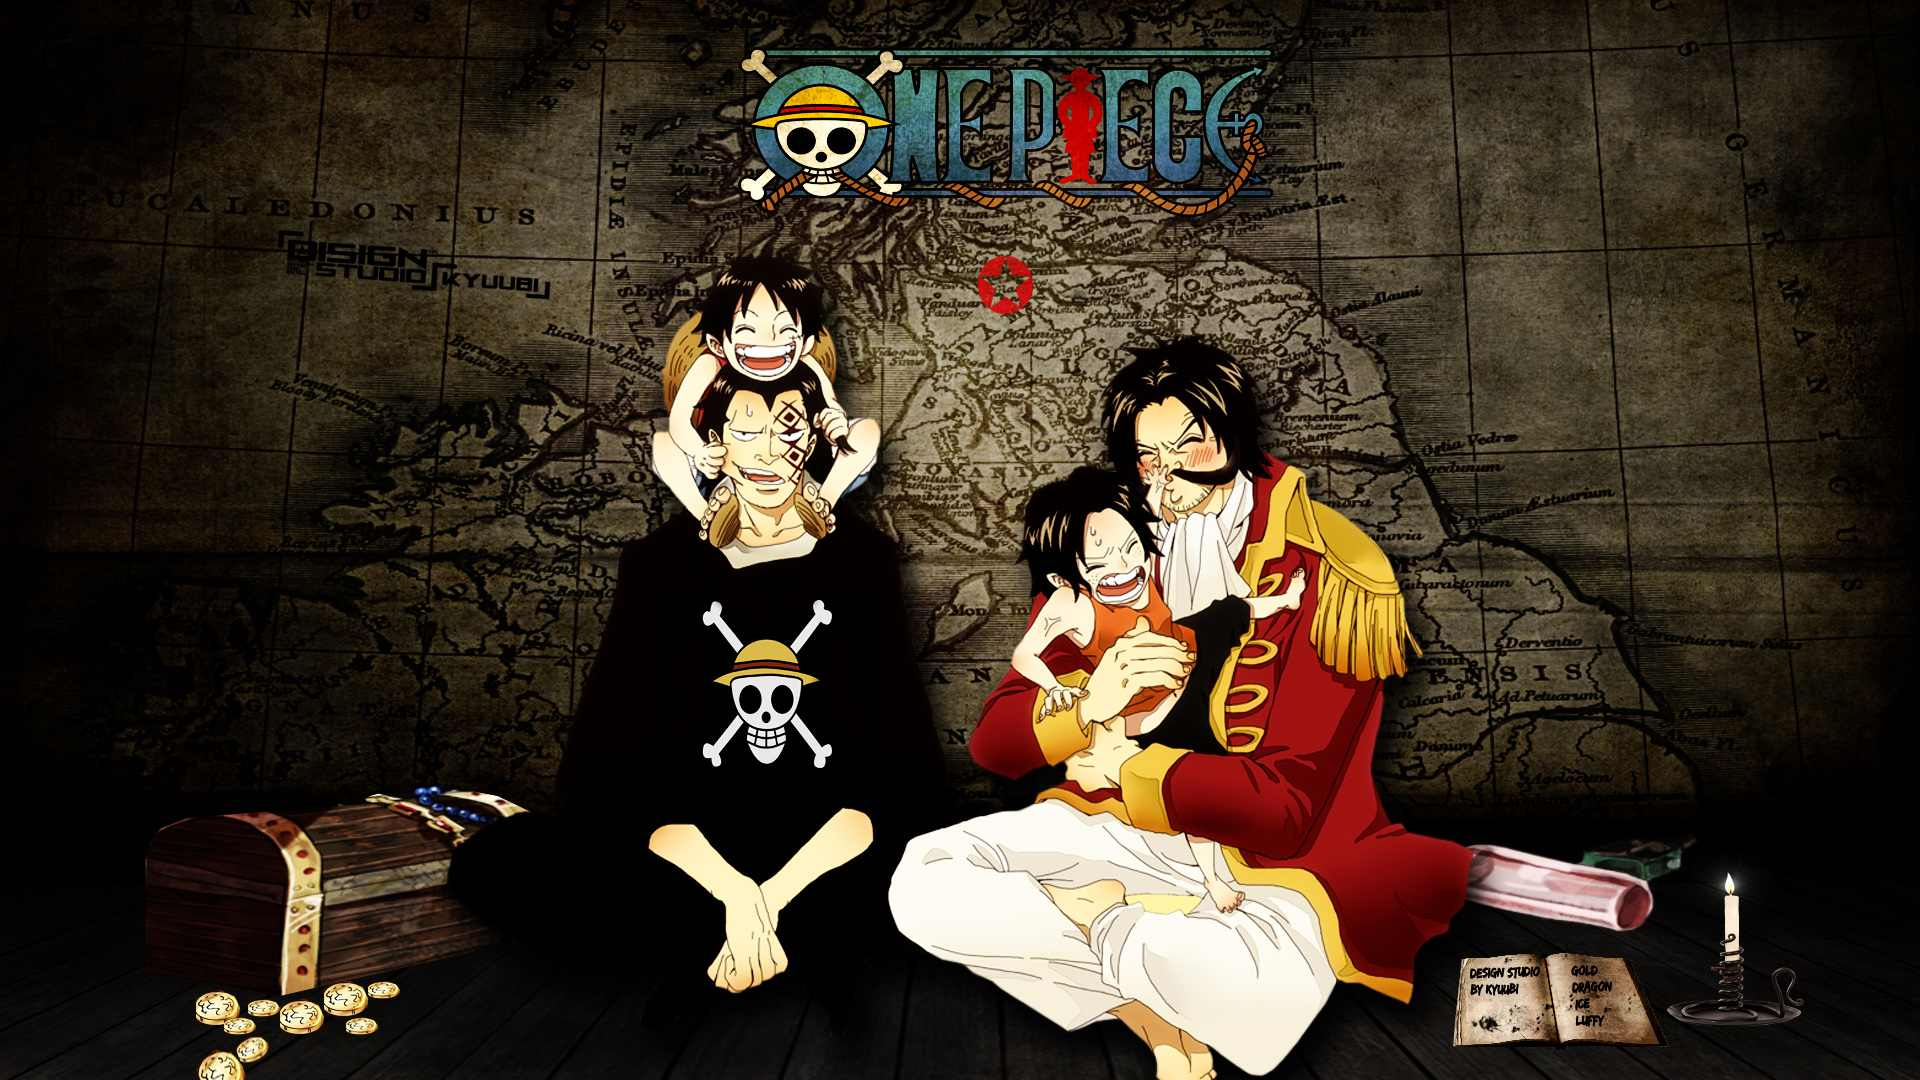 Nice One Piece Hd Wallpapers For Desktop Free Hd Wallpaper